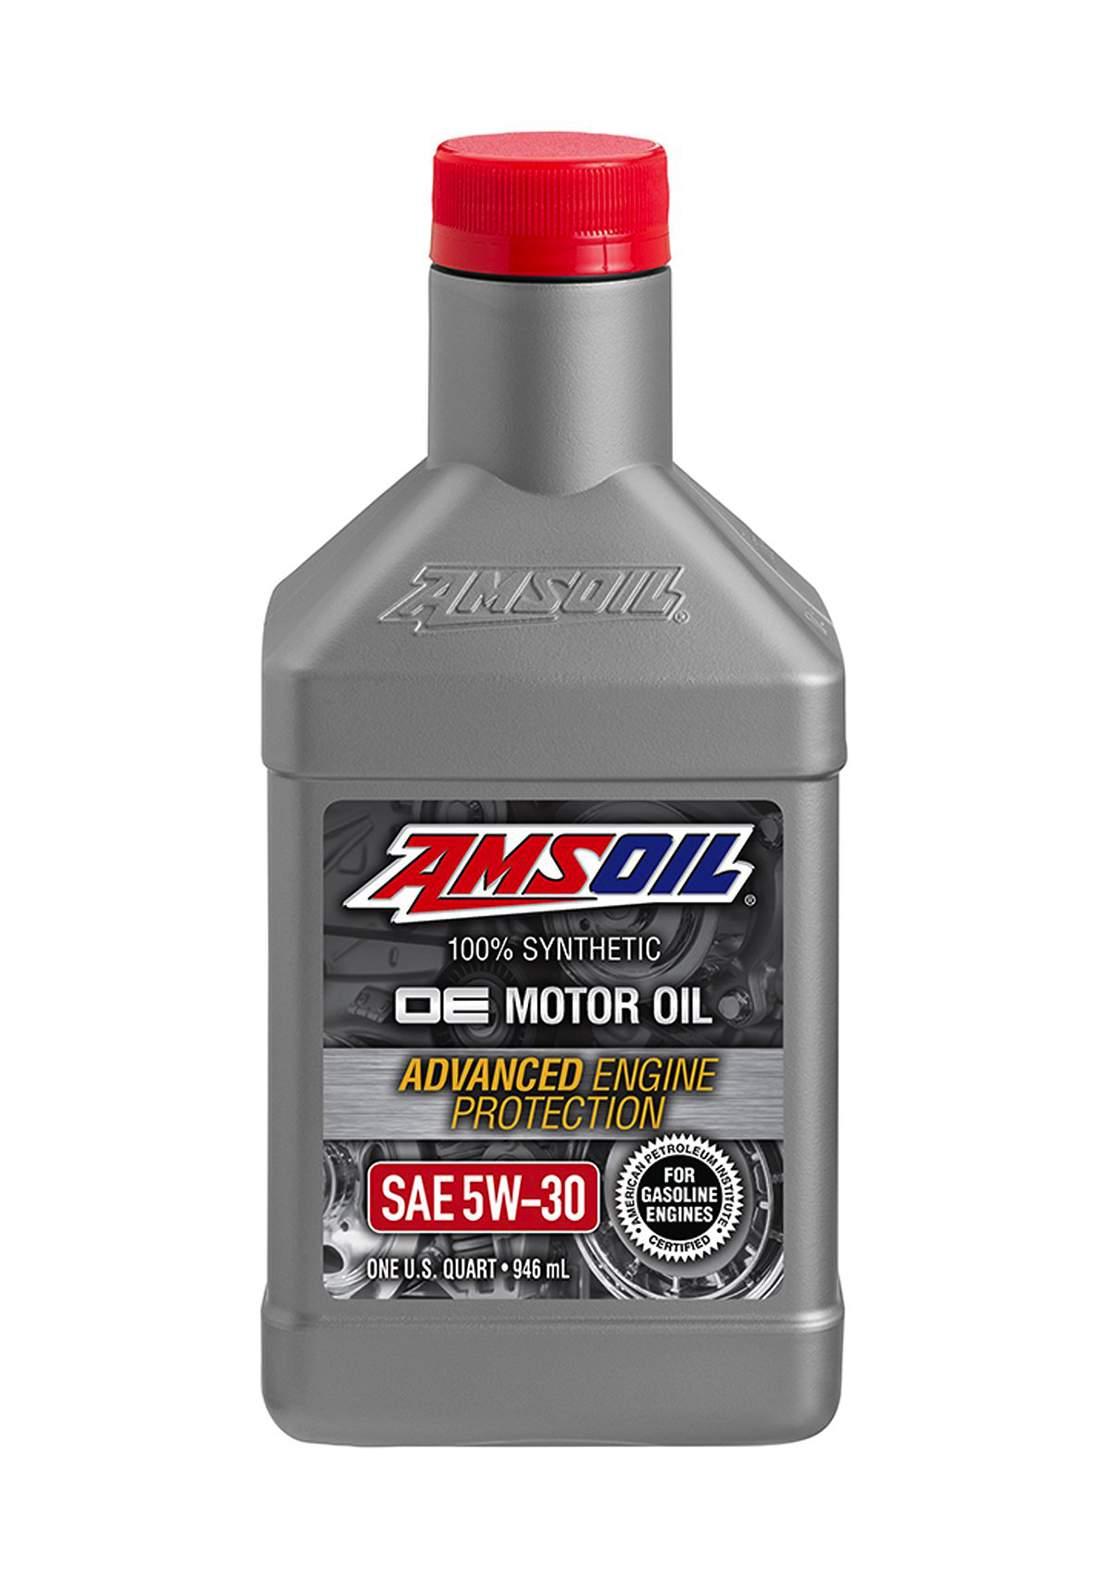 AMSOil 5W-30 Synthetic OE Motor Oil 946 ml زيت المحرك